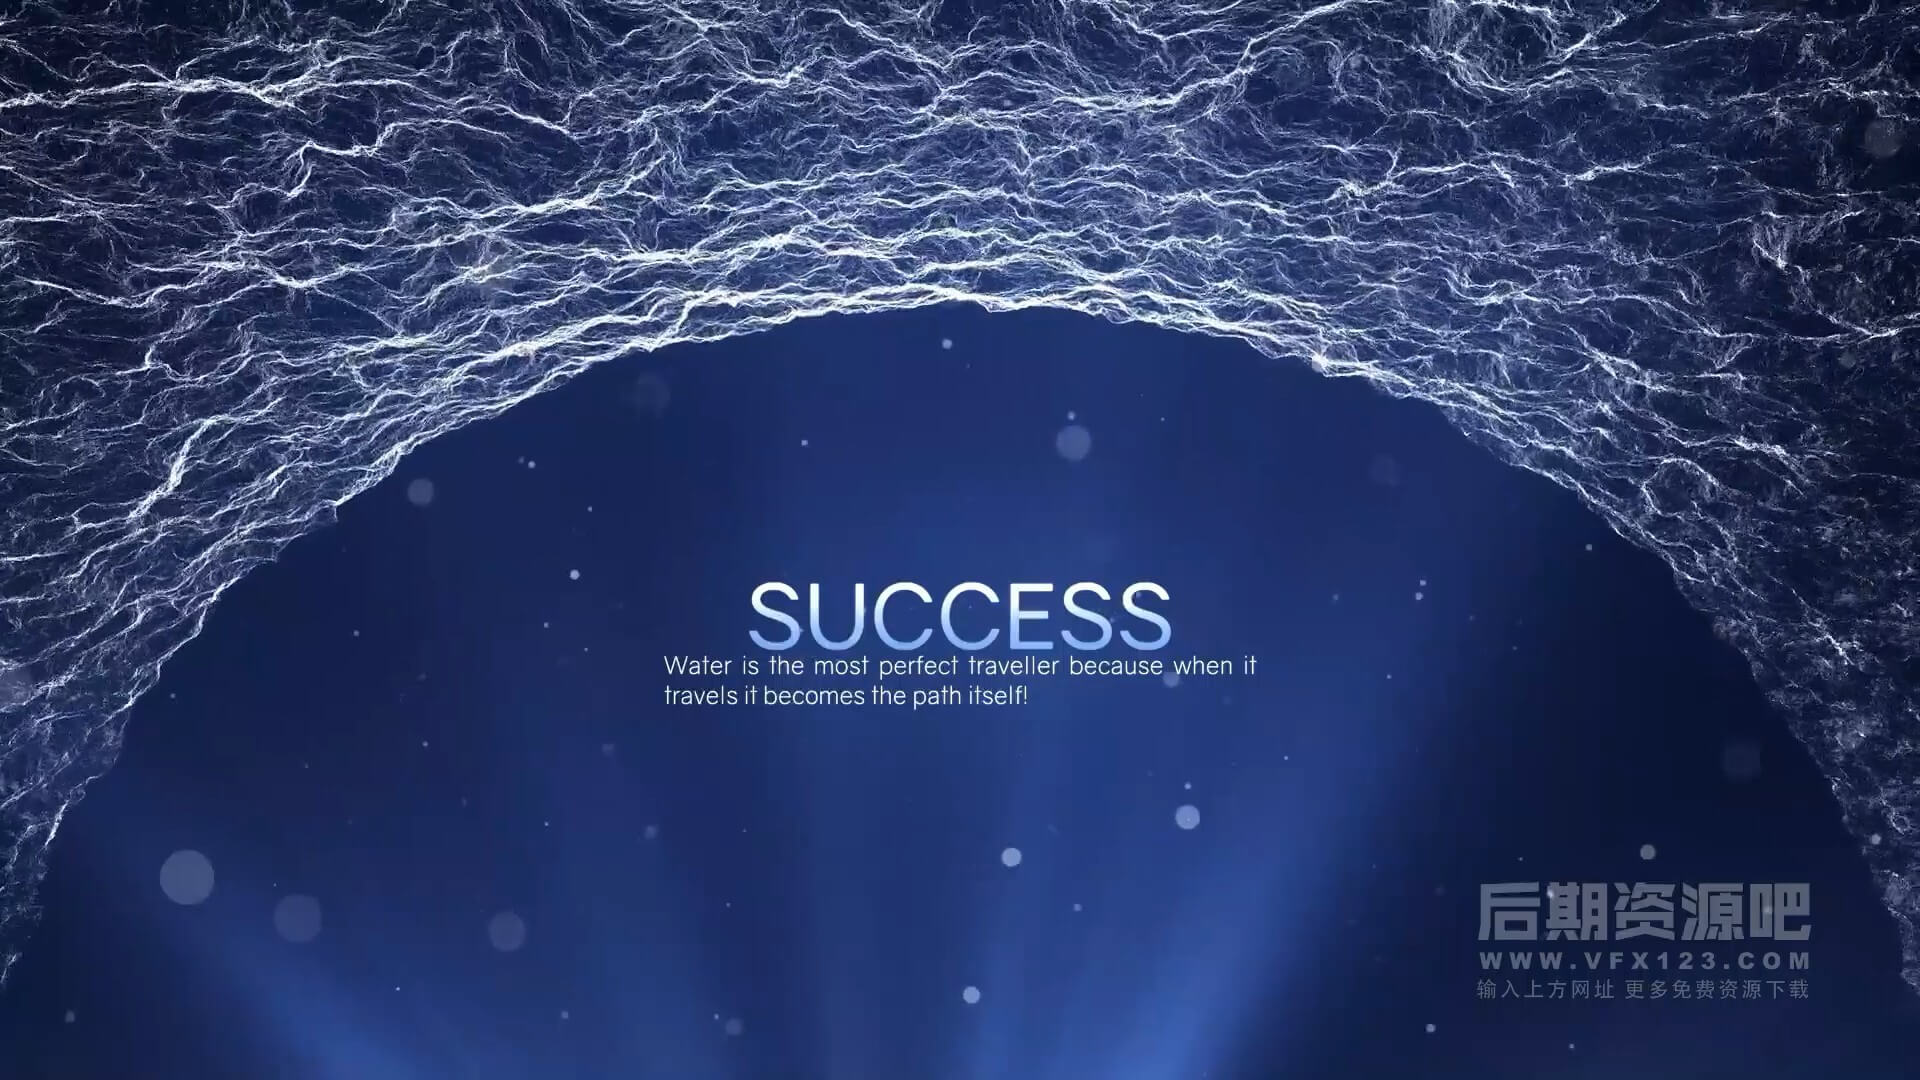 fcpx主题模板 四维水主题励志创意大气电影预告片 Water Inspirational